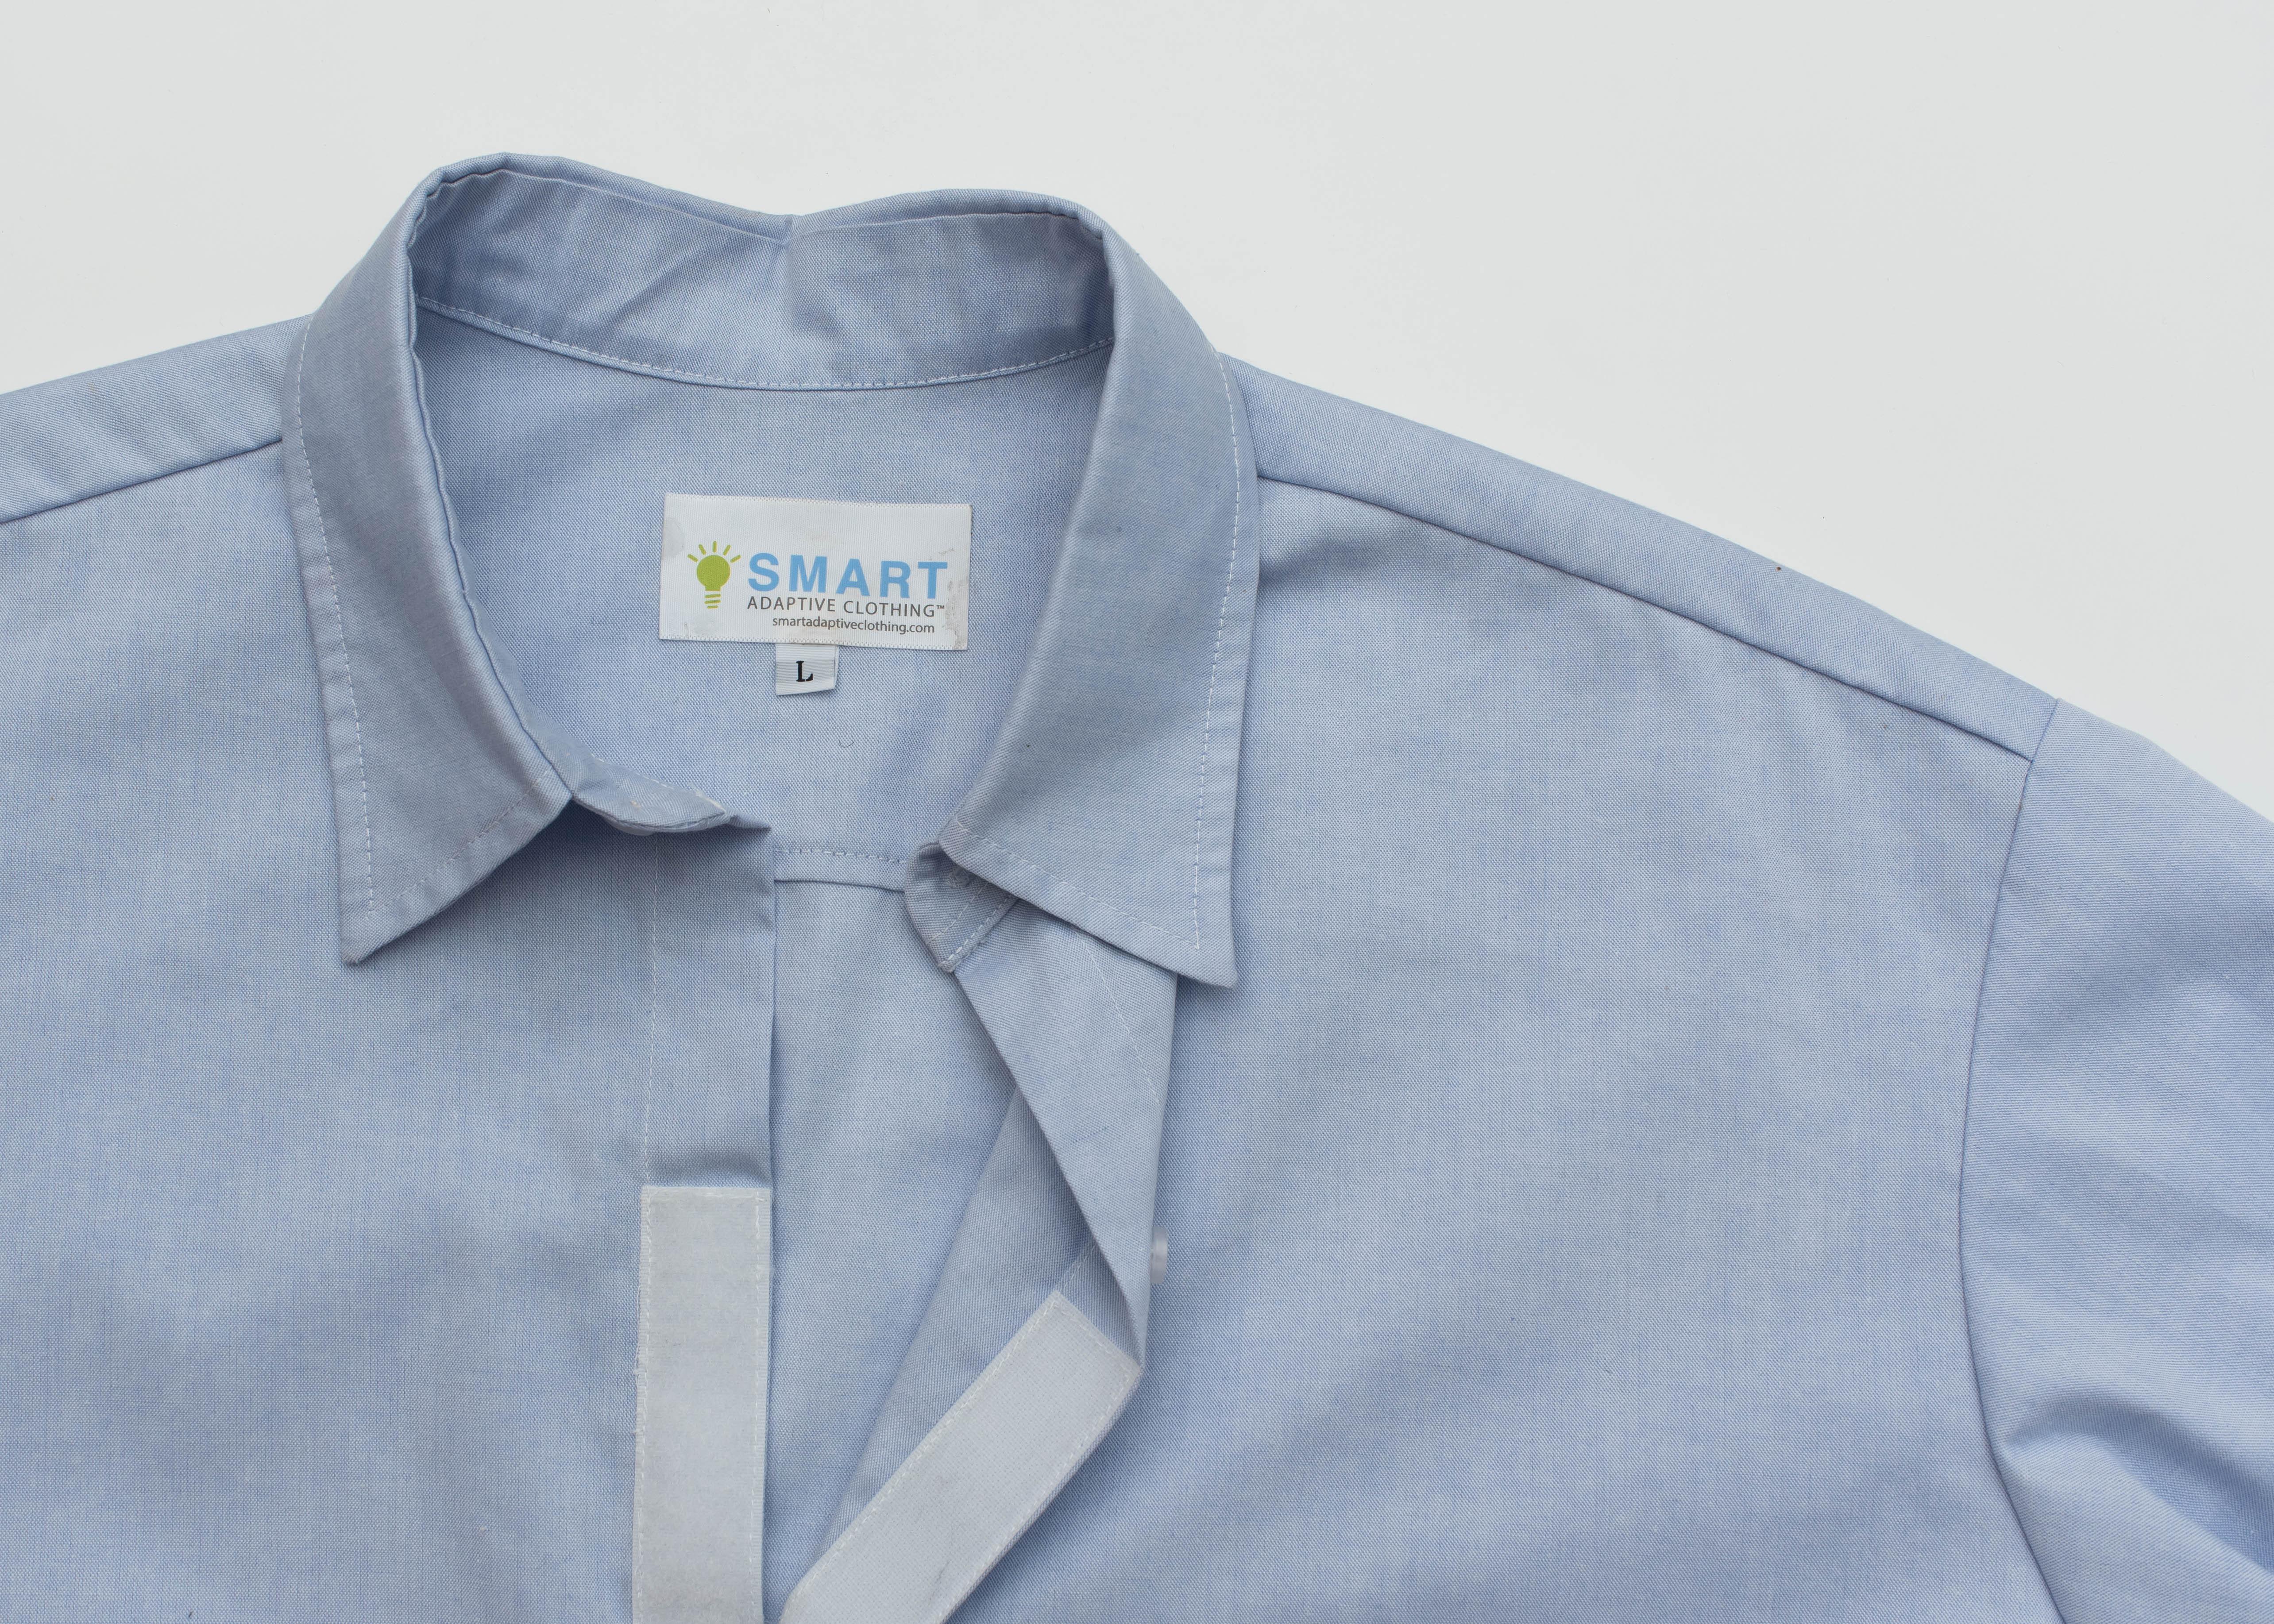 Smart Adaptive Clothing front placket Ve